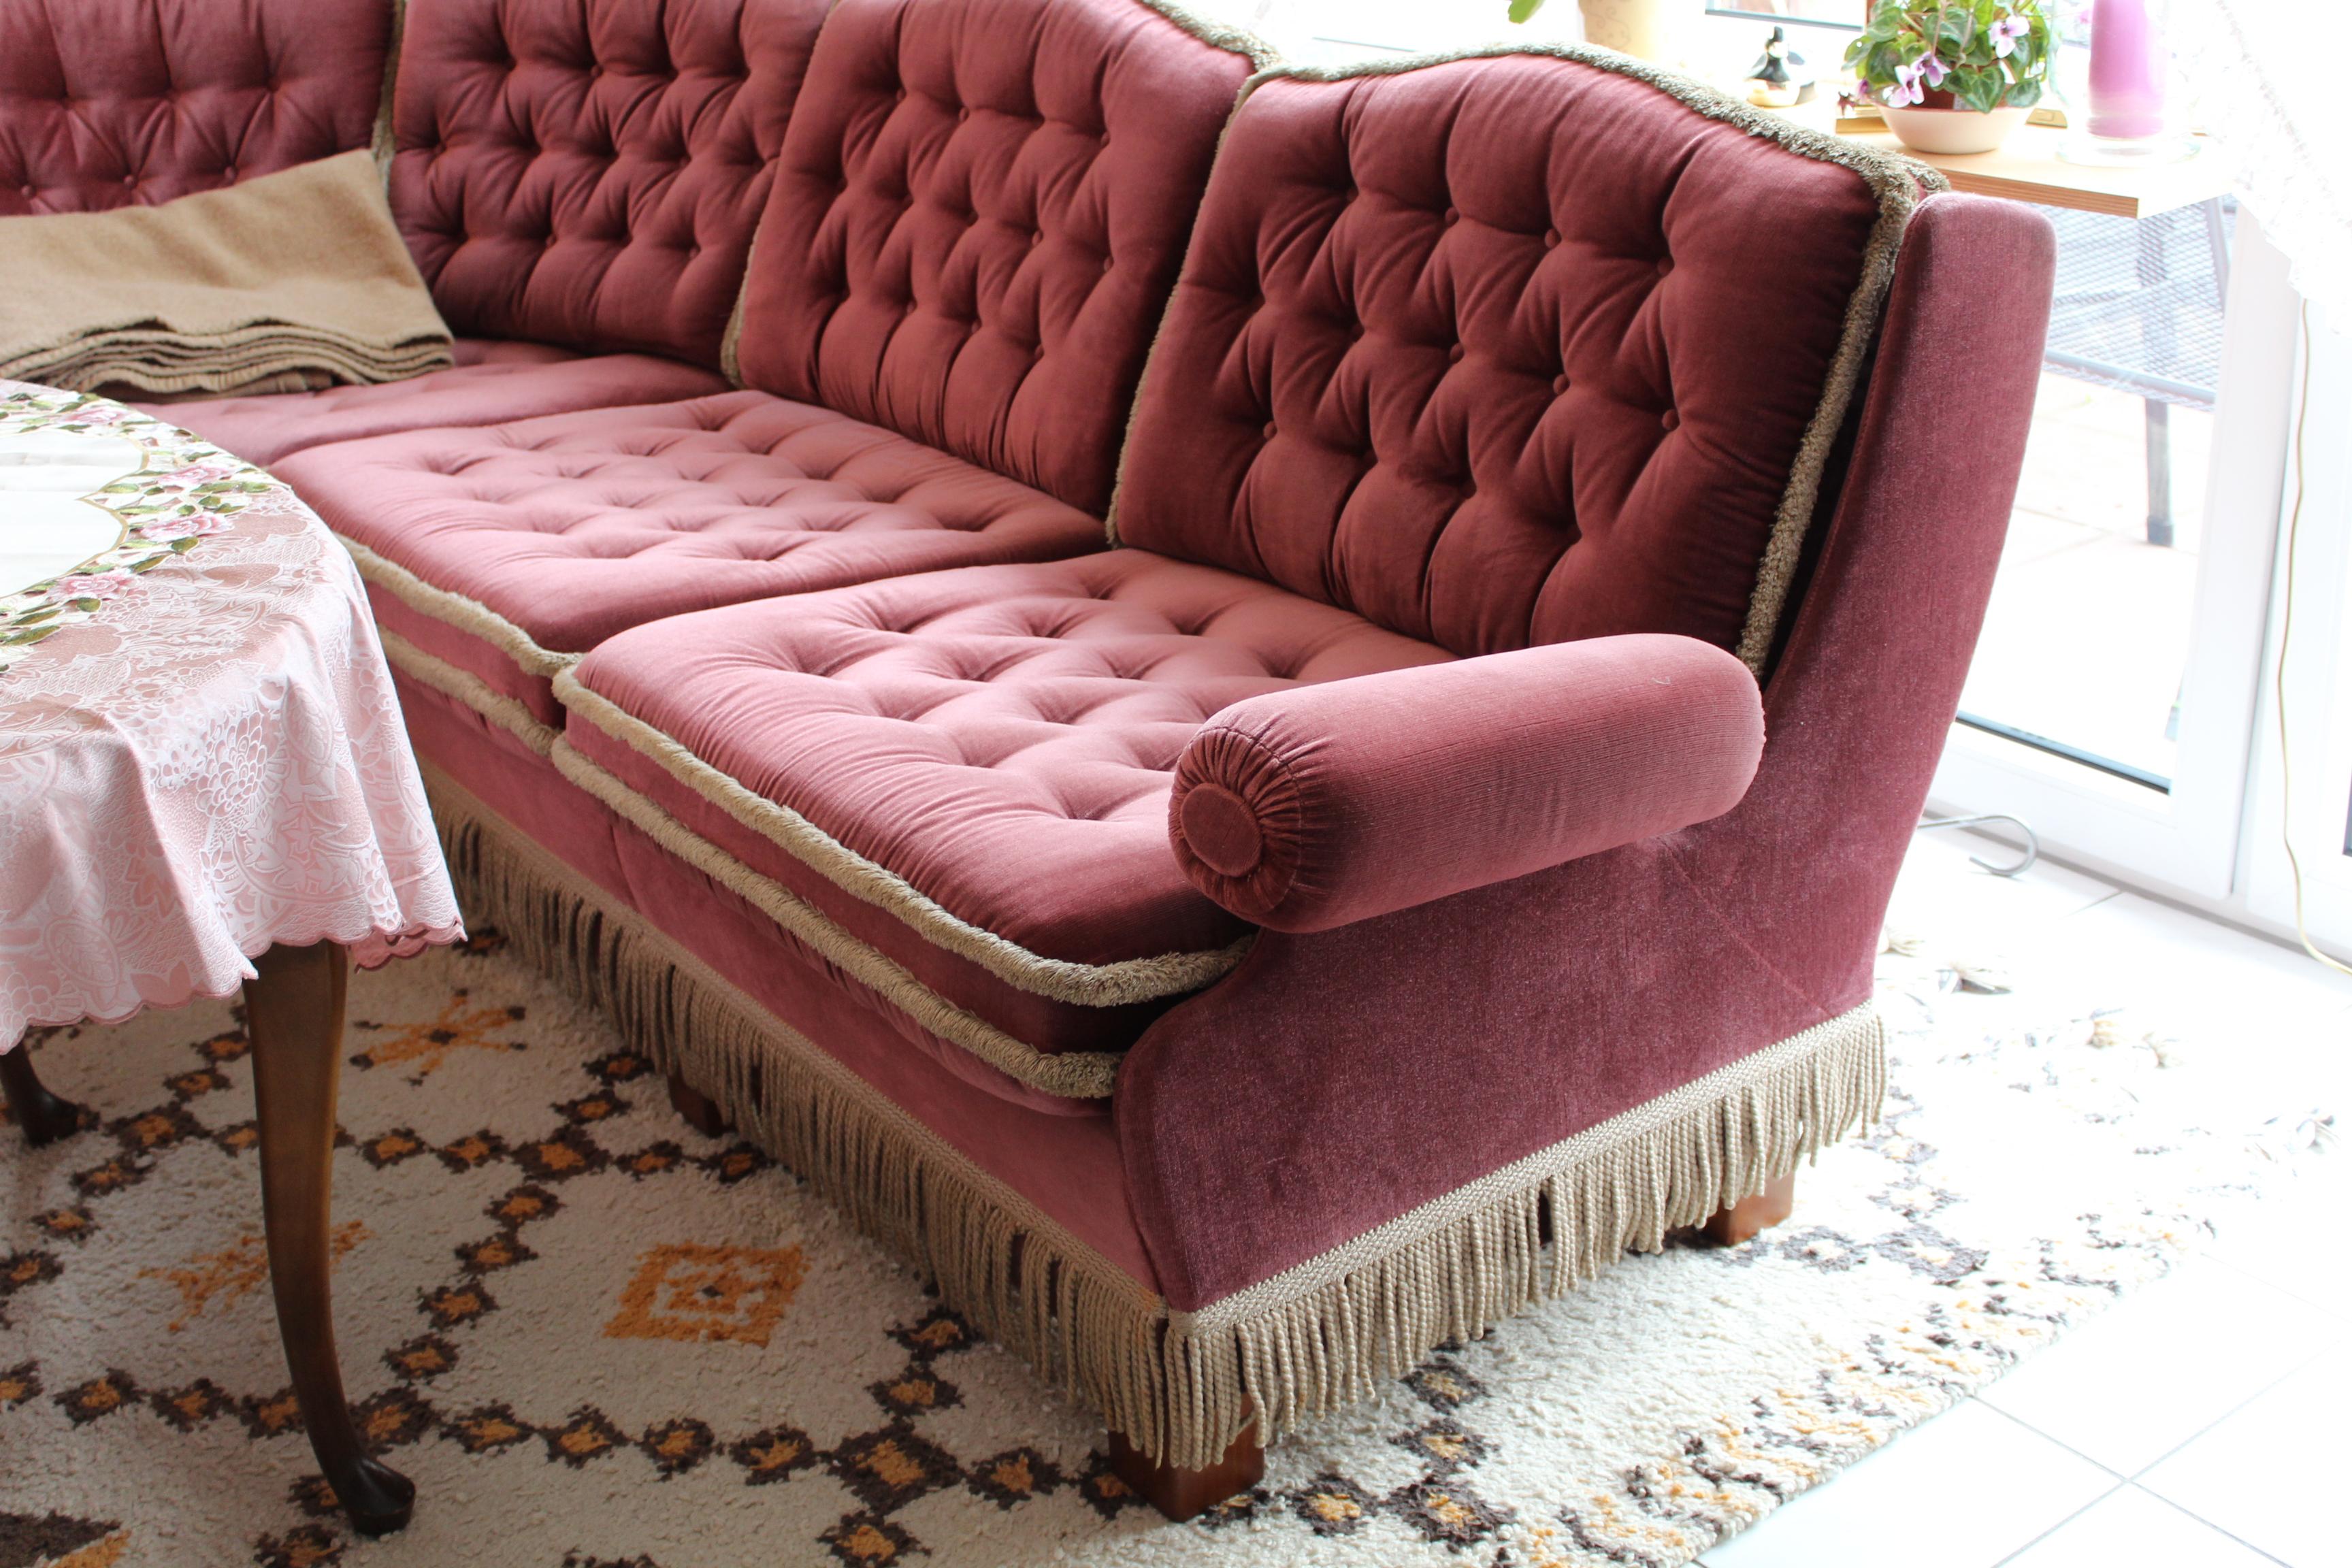 gro artig polsterm bel paderborn bilder die kinderzimmer design ideen. Black Bedroom Furniture Sets. Home Design Ideas